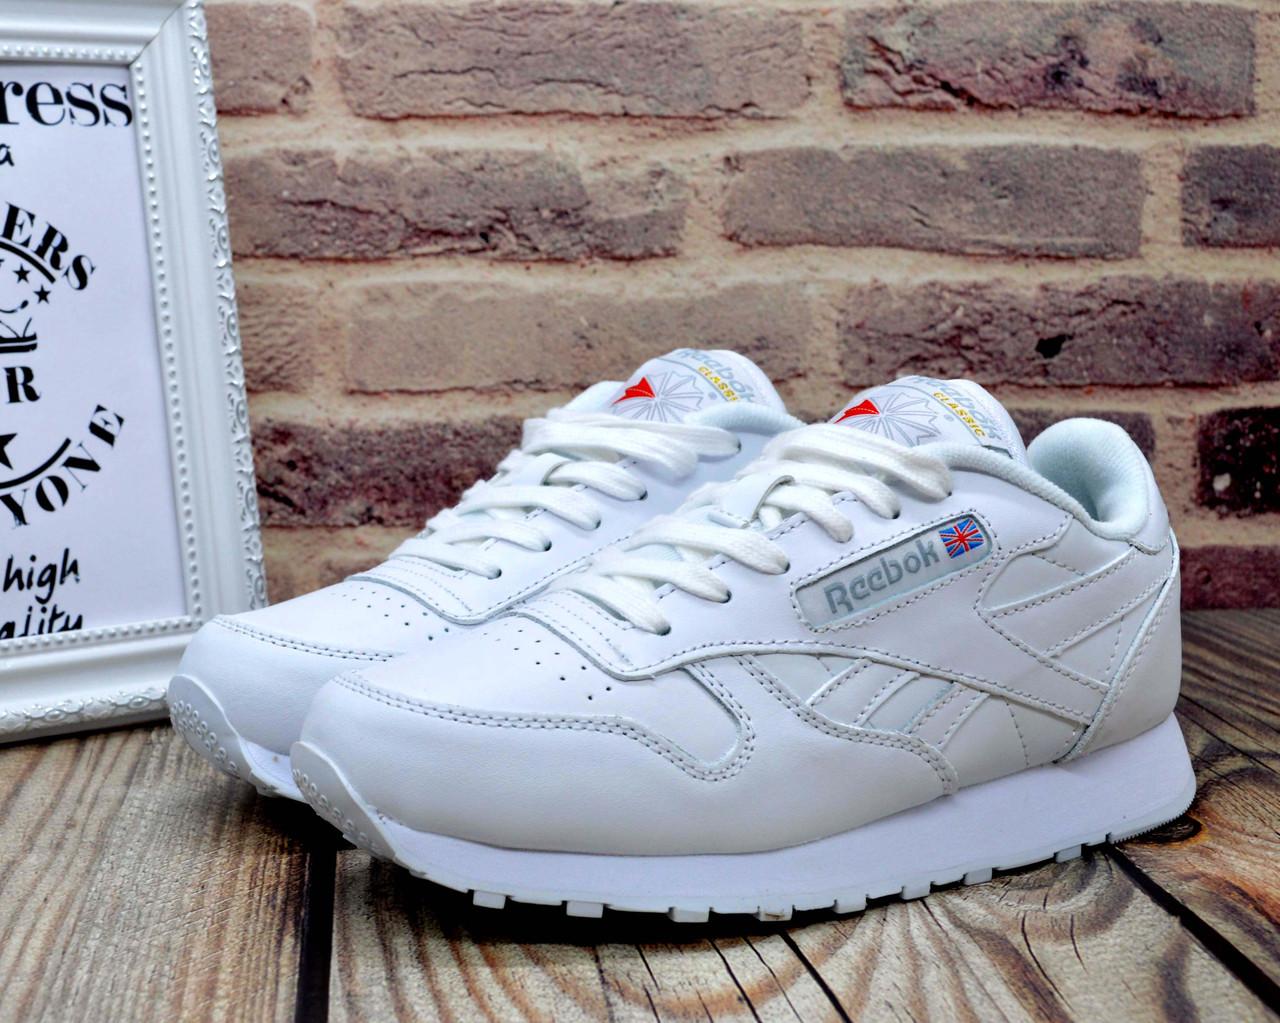 ✅Reebok Classic White Женские кожаные кроссовки Рибок Классик белые